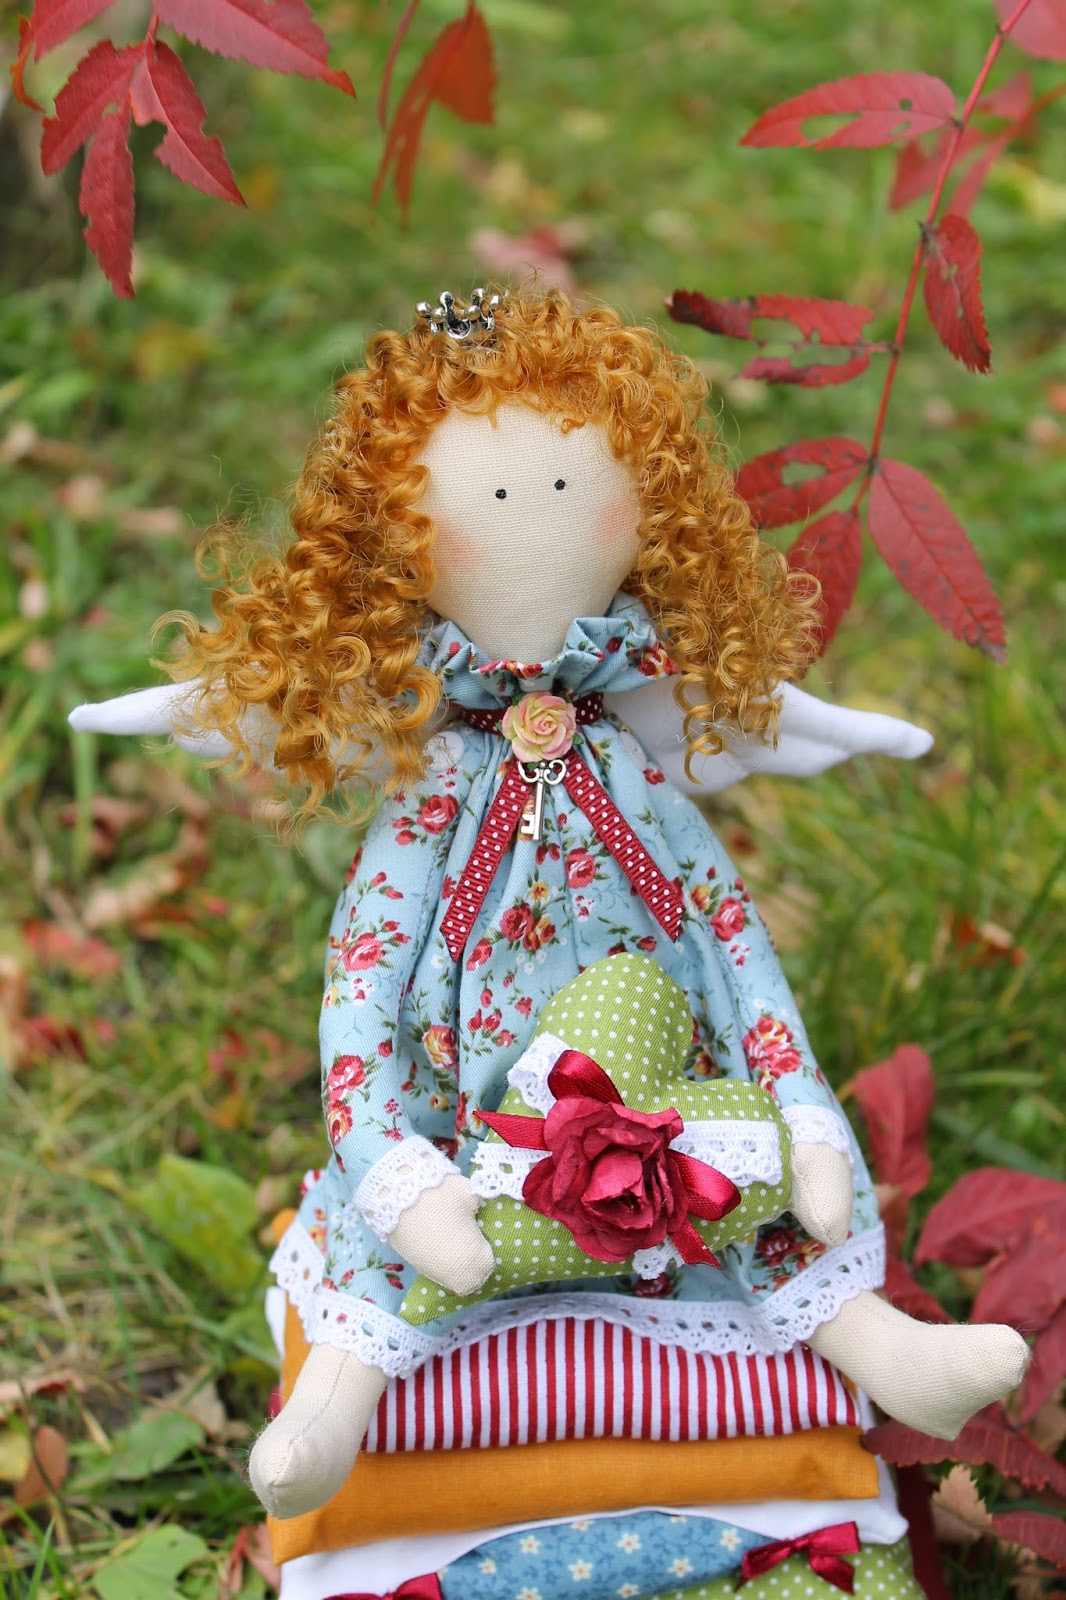 Принцесса на горошине, принцесса, тильда принцесса, тильда, кукла тильда, текстильная кукла, купить игрушку